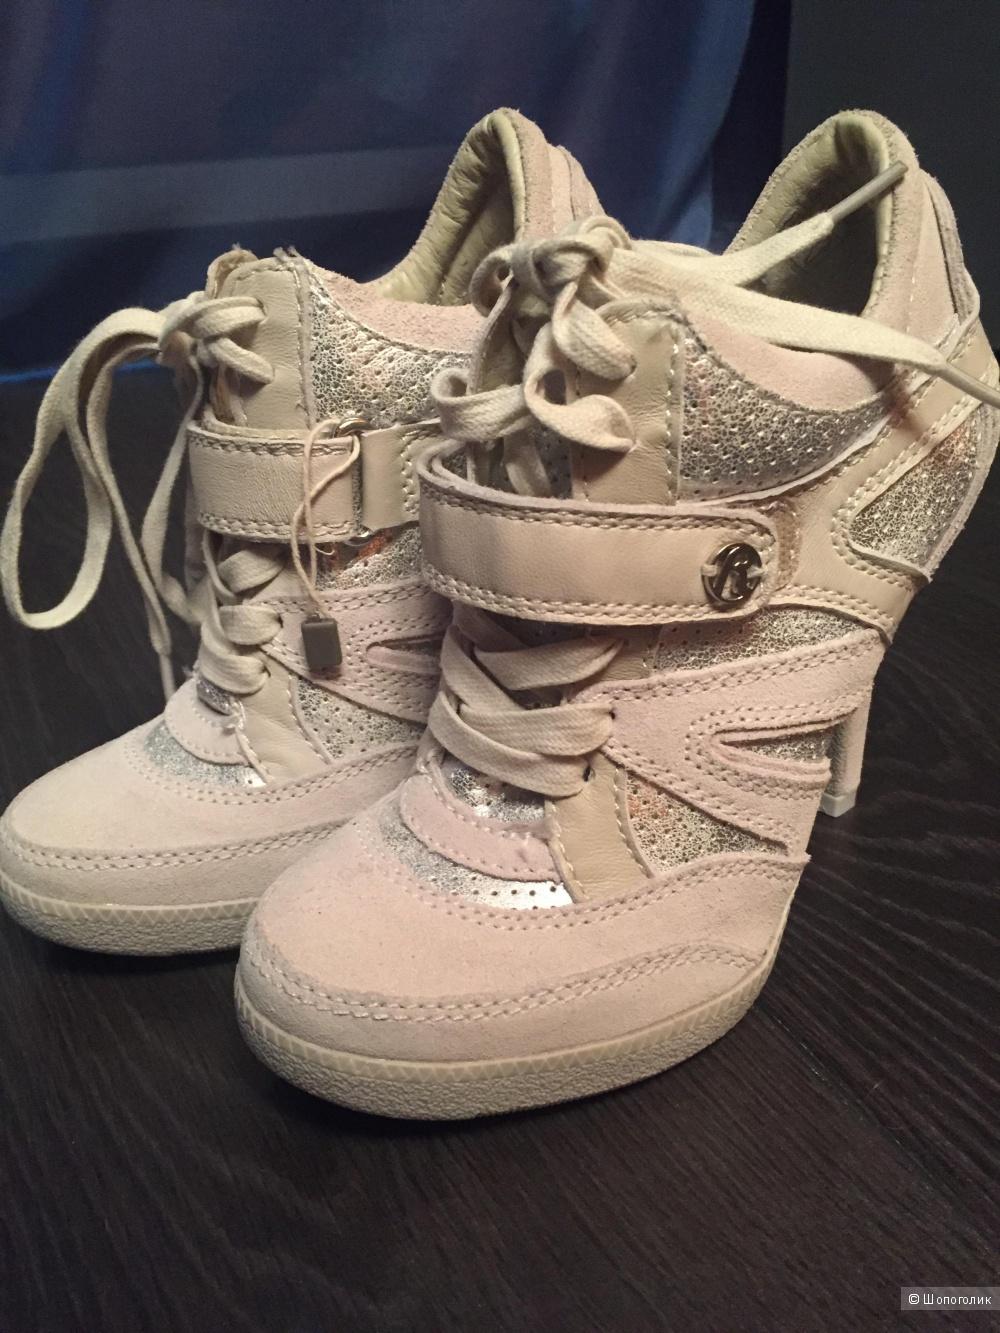 Спортивного стиля ботиночки на каблуке Repley 35 размер